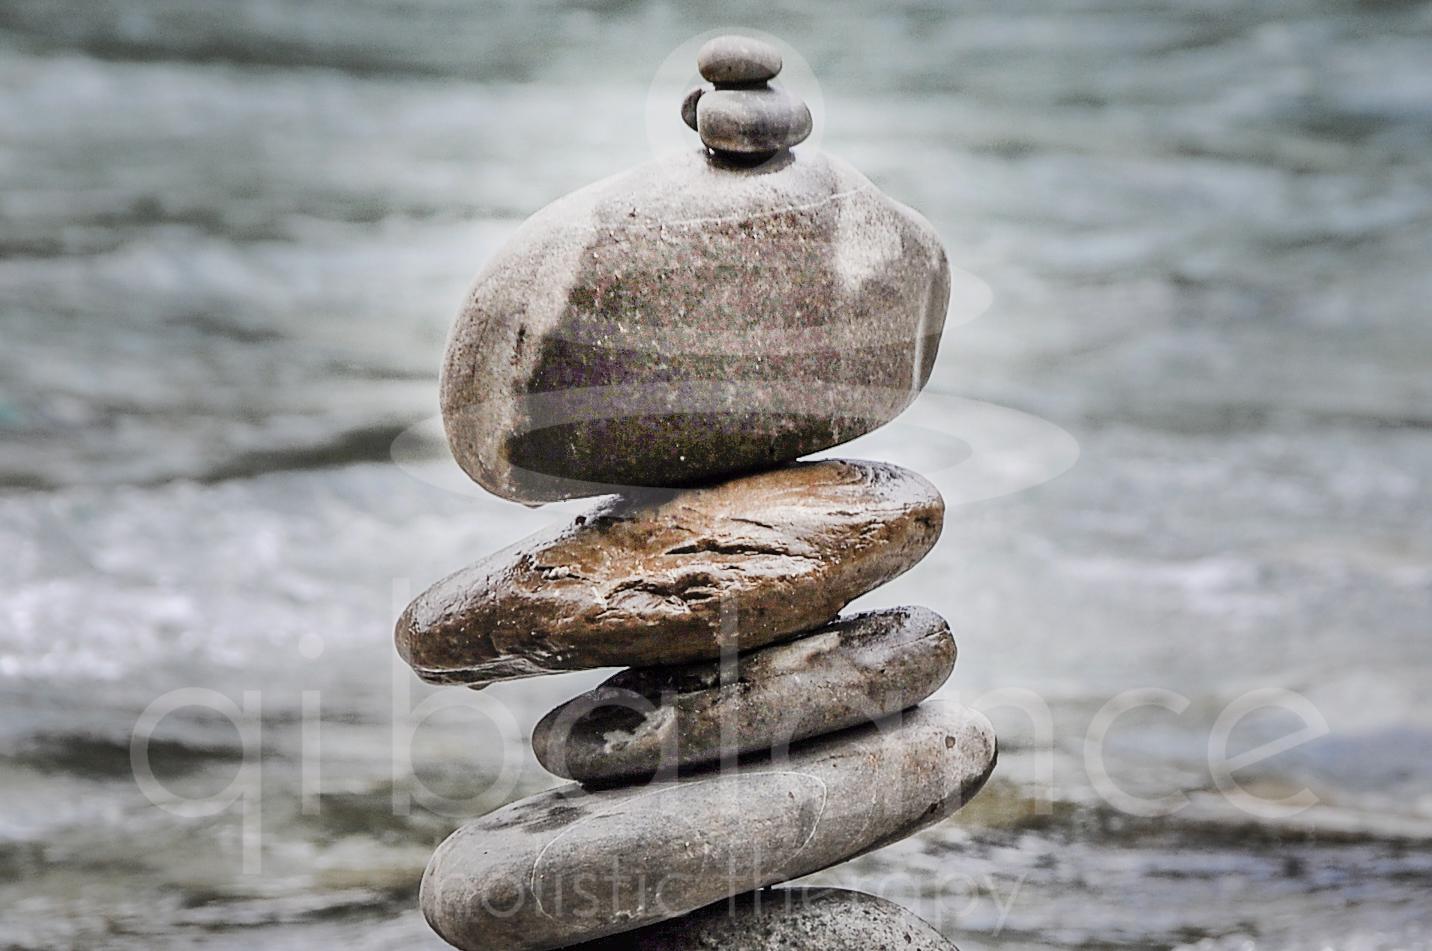 Qi (chi) balance - Qi (chi) είναιη κινέζικη ονομασία της ζωτικής μας ενέργειας. Σύμφωνα με την παραδοσιακή κινέζικη ιατρική το Qi πρέπει να κινείται αδιάκοπα και ανεμπόδιστα μέσα στο σώμα μας ώστε να διατηρεί την ισορροπία στις λειτουργίες του σώματος και του νουμας.Έτσι επιτυγχάνεται η καλή υγεία και η μακροζωία.Για να κινείται συνεχώς και ελεύθερα το Qi, χρειάζεται να είναι σε ισορροπία οι δύο αντίθετες αλλά συμπληρωματικές συμπαντικές δυνάμεις: το Yin(γιν) και το Yang (γιάνγκ)Mέσα από τις διάφορες θεραπευτικές τέχνες που ασκούμε στο θεραπευτικό μας κέντρο